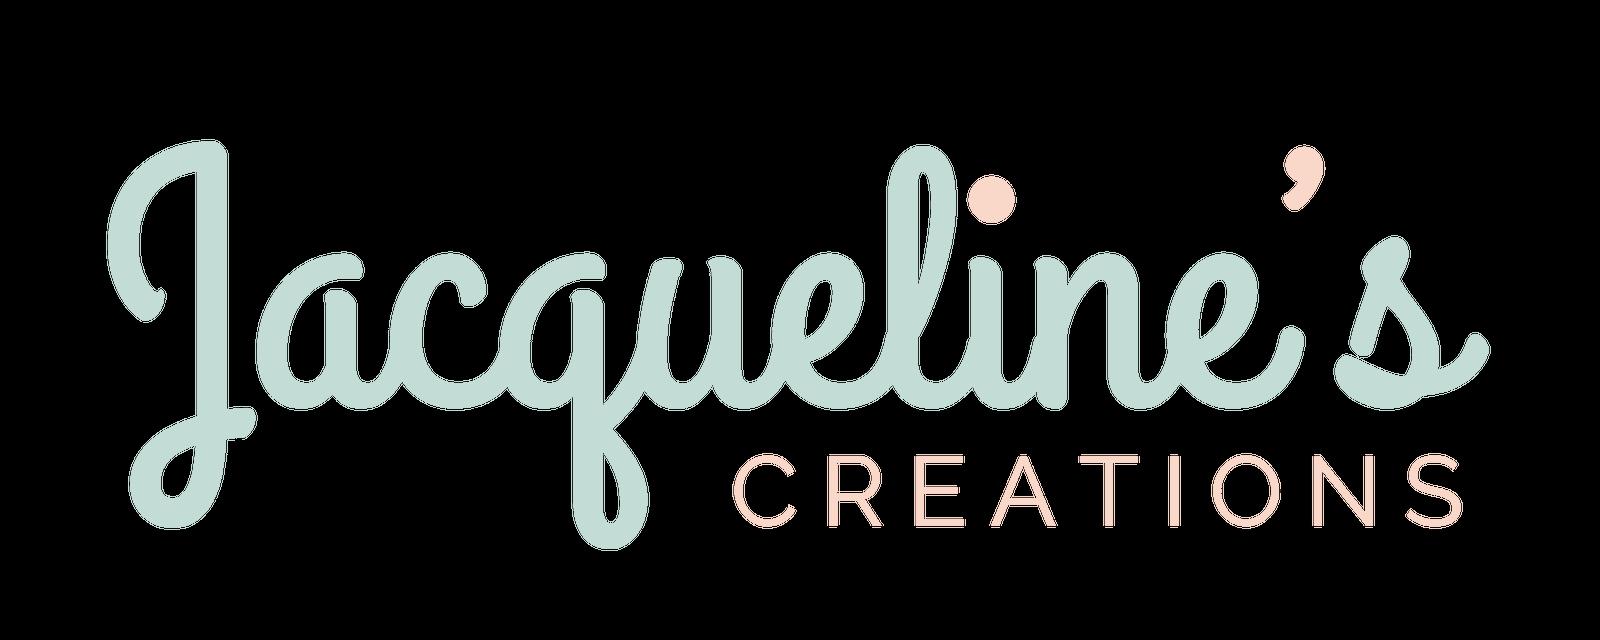 Jacqueline's Creations